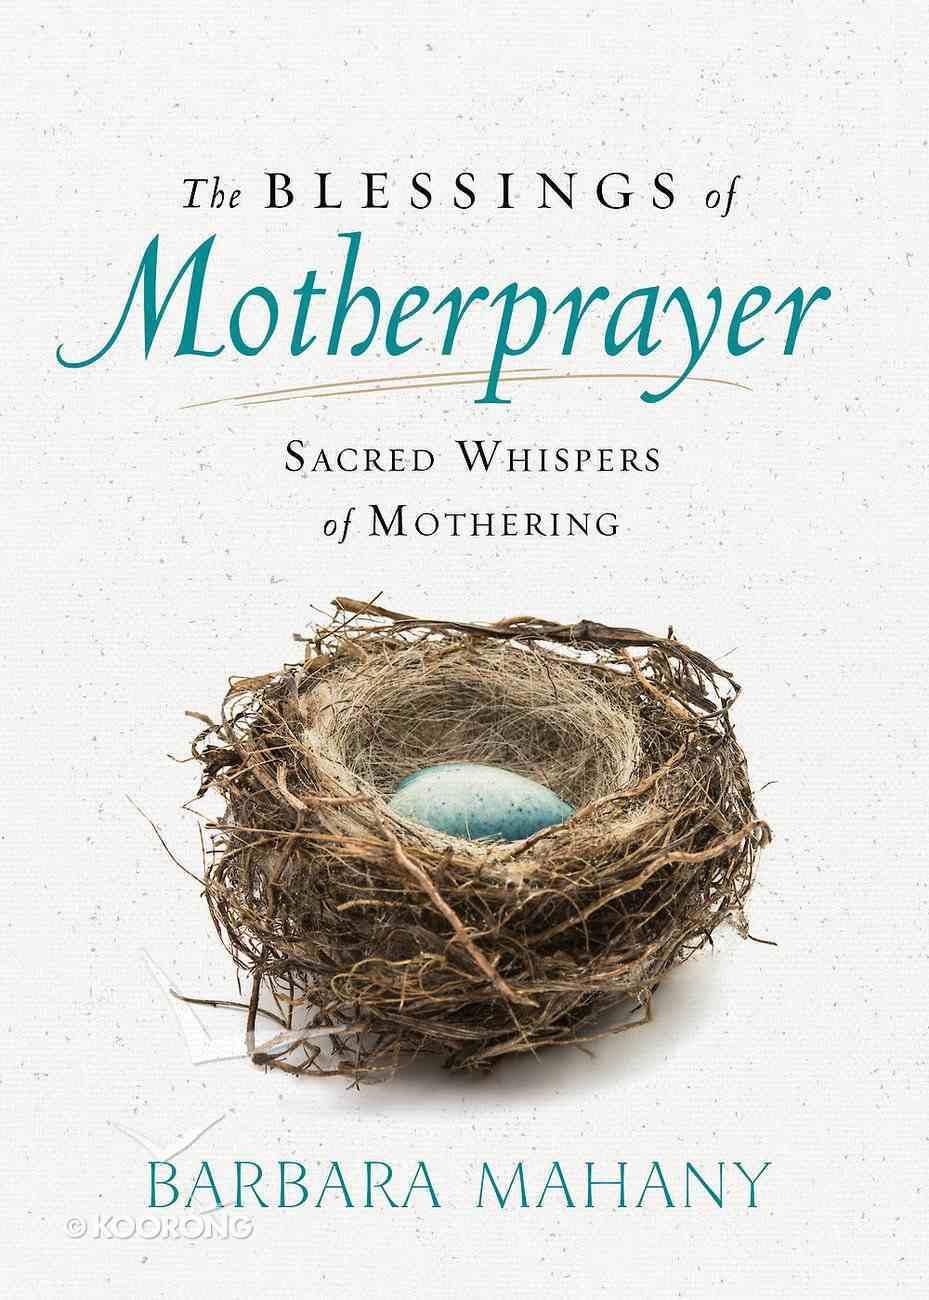 The Blessings of Motherprayer: Sacred Whispers of Mothering eBook